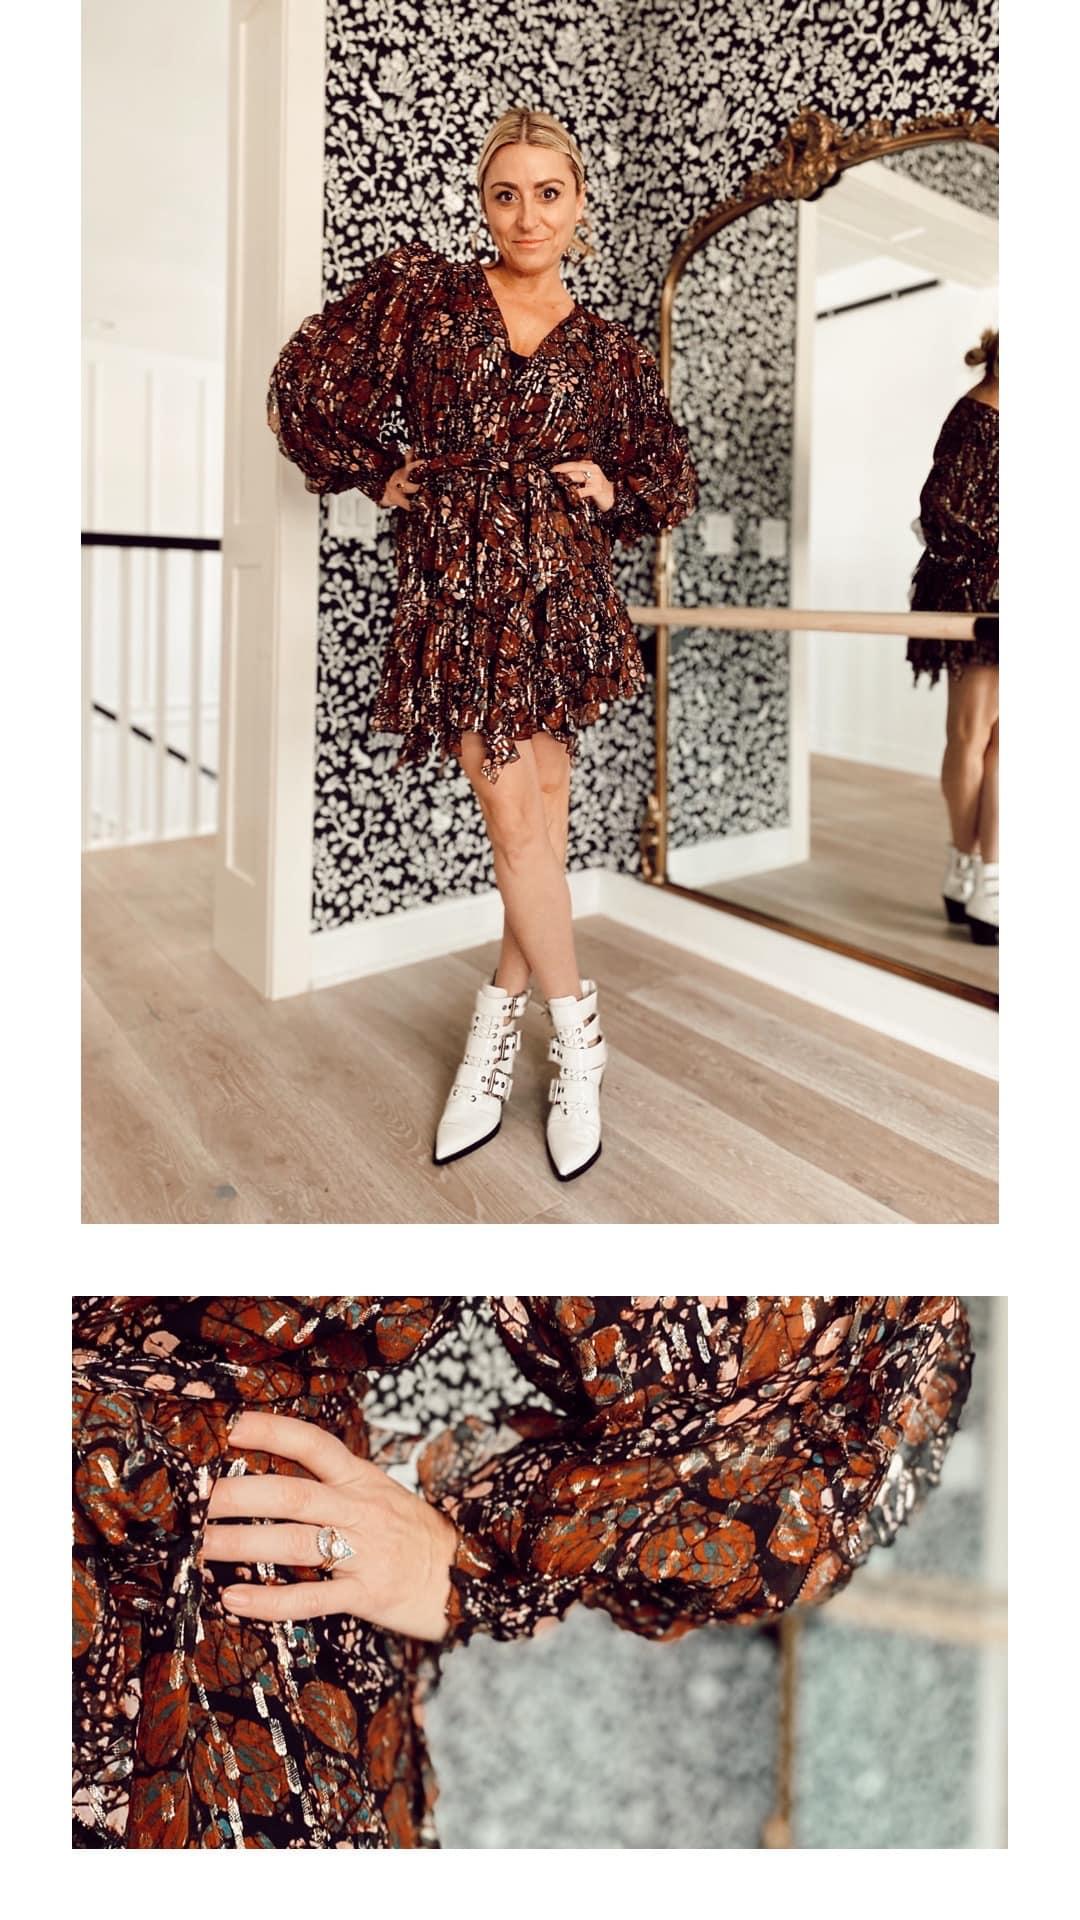 stylish woman with fashion details